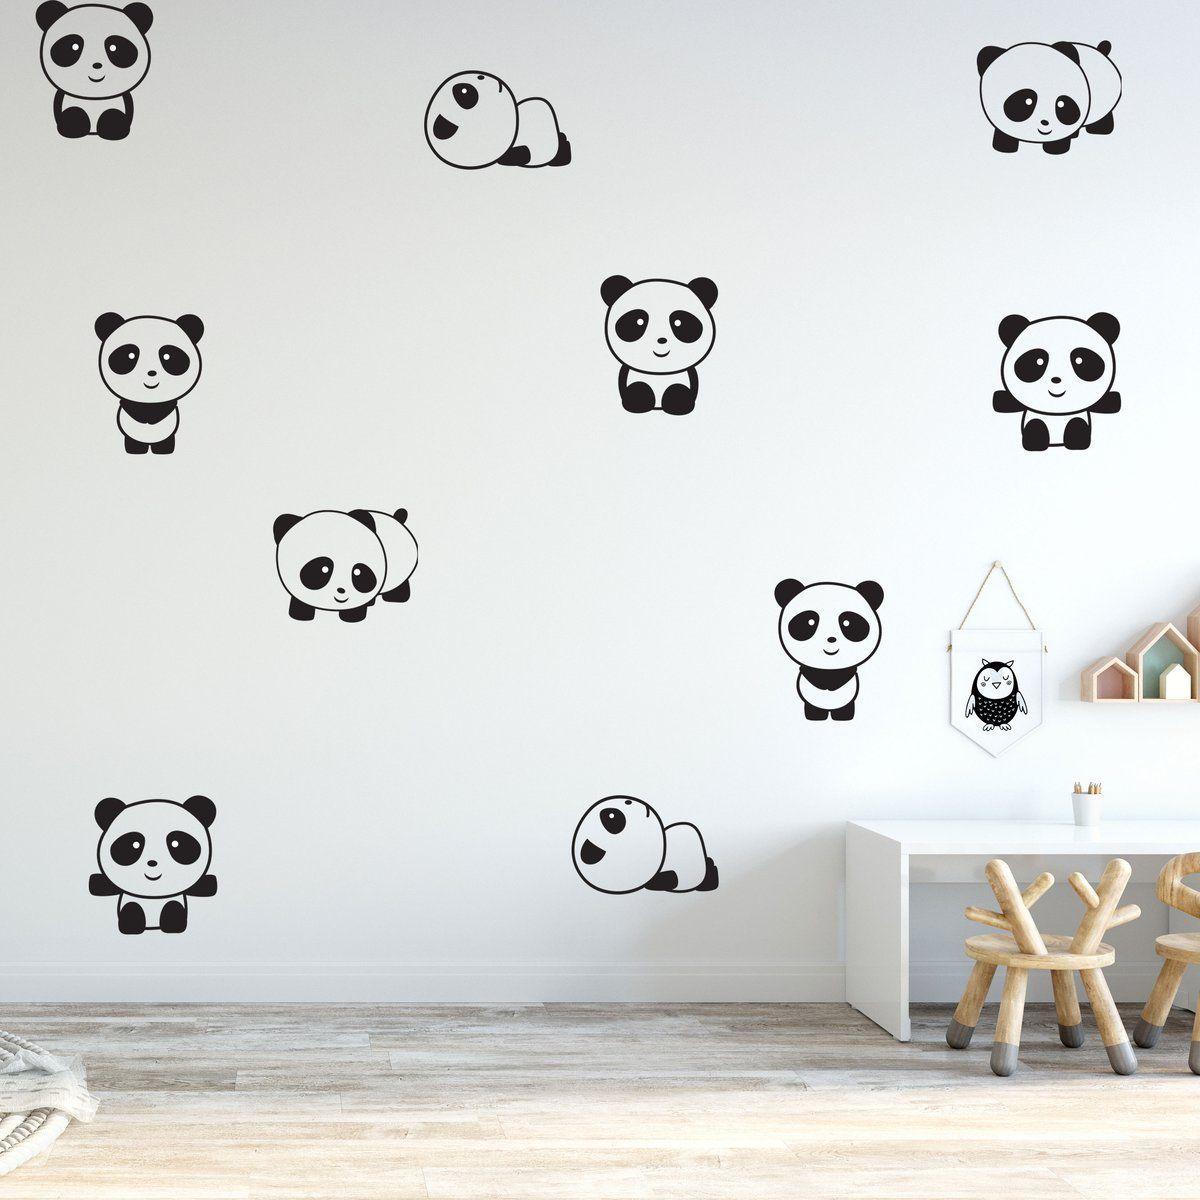 Wall Sticker Room Decal Panda Bear Sleeping Zzz Nursery Bed Kids Children bo2531